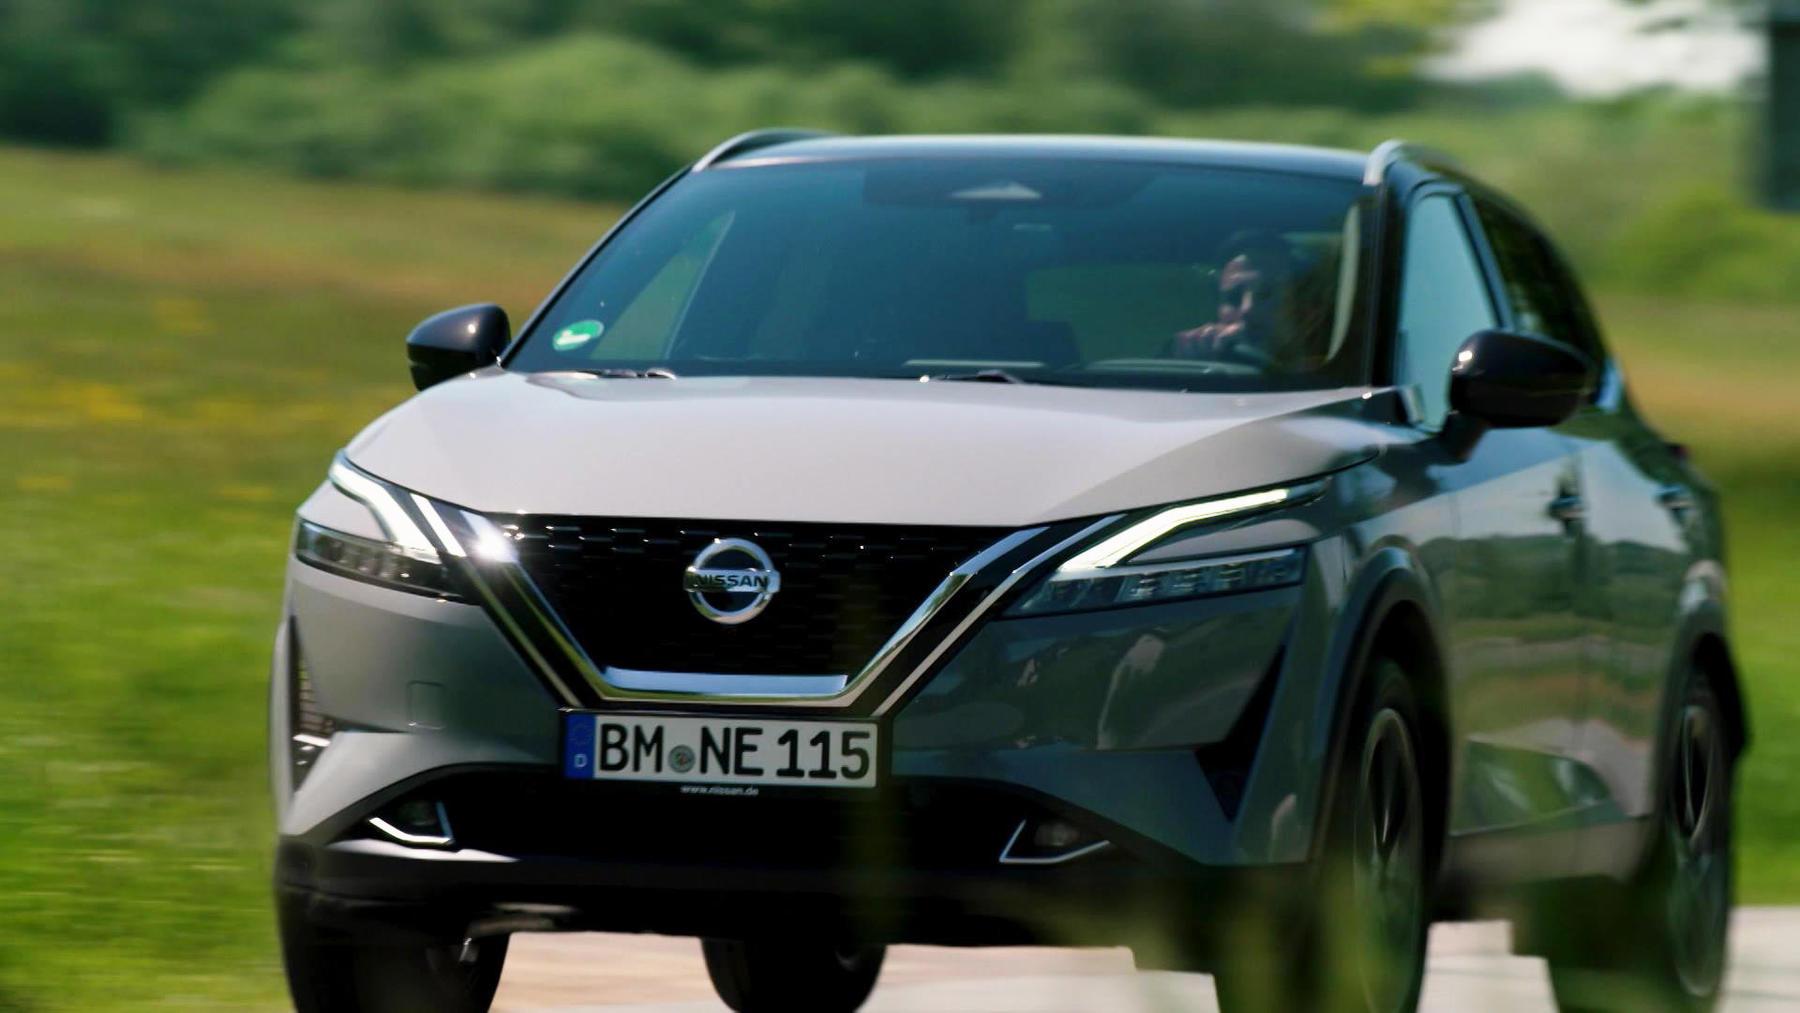 Heute u.a.: Der neue Nissan Qashqai